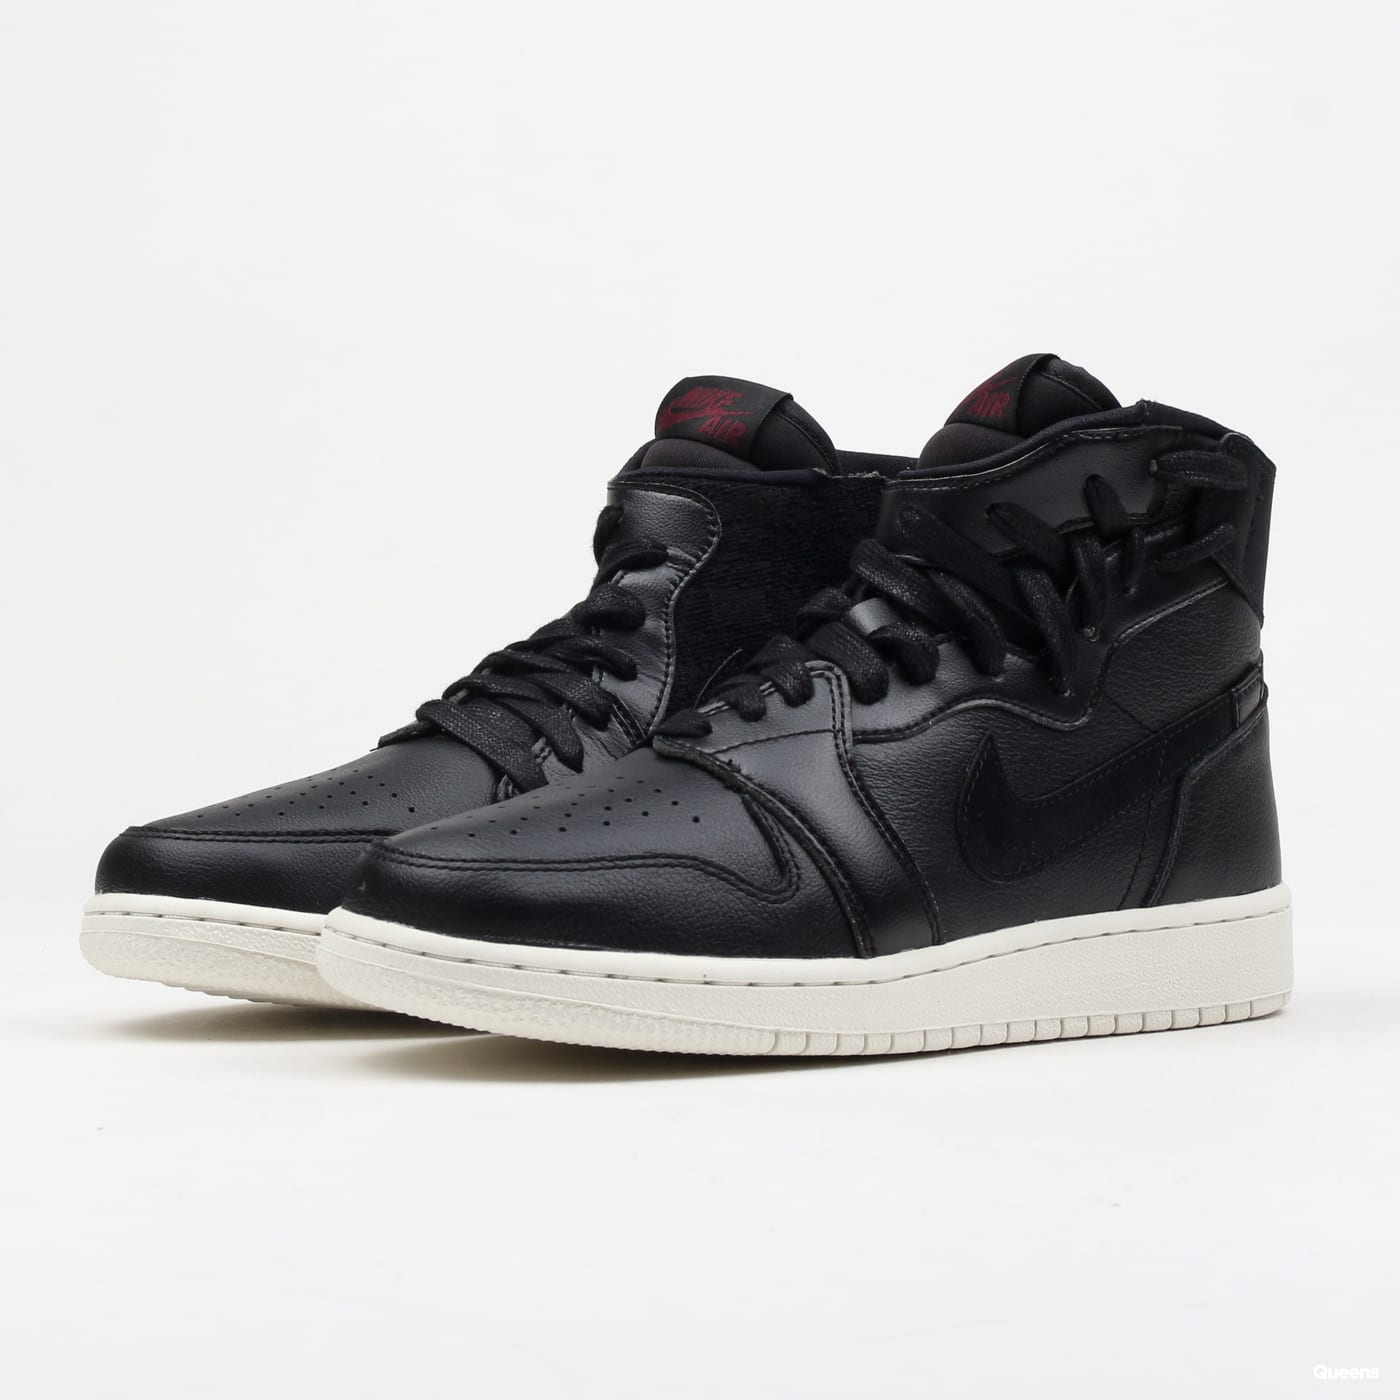 best sneakers 5be76 3a3df Jordan WMNS Air Jordan 1 Rebel XX (AR5599-006)– Queens 💚